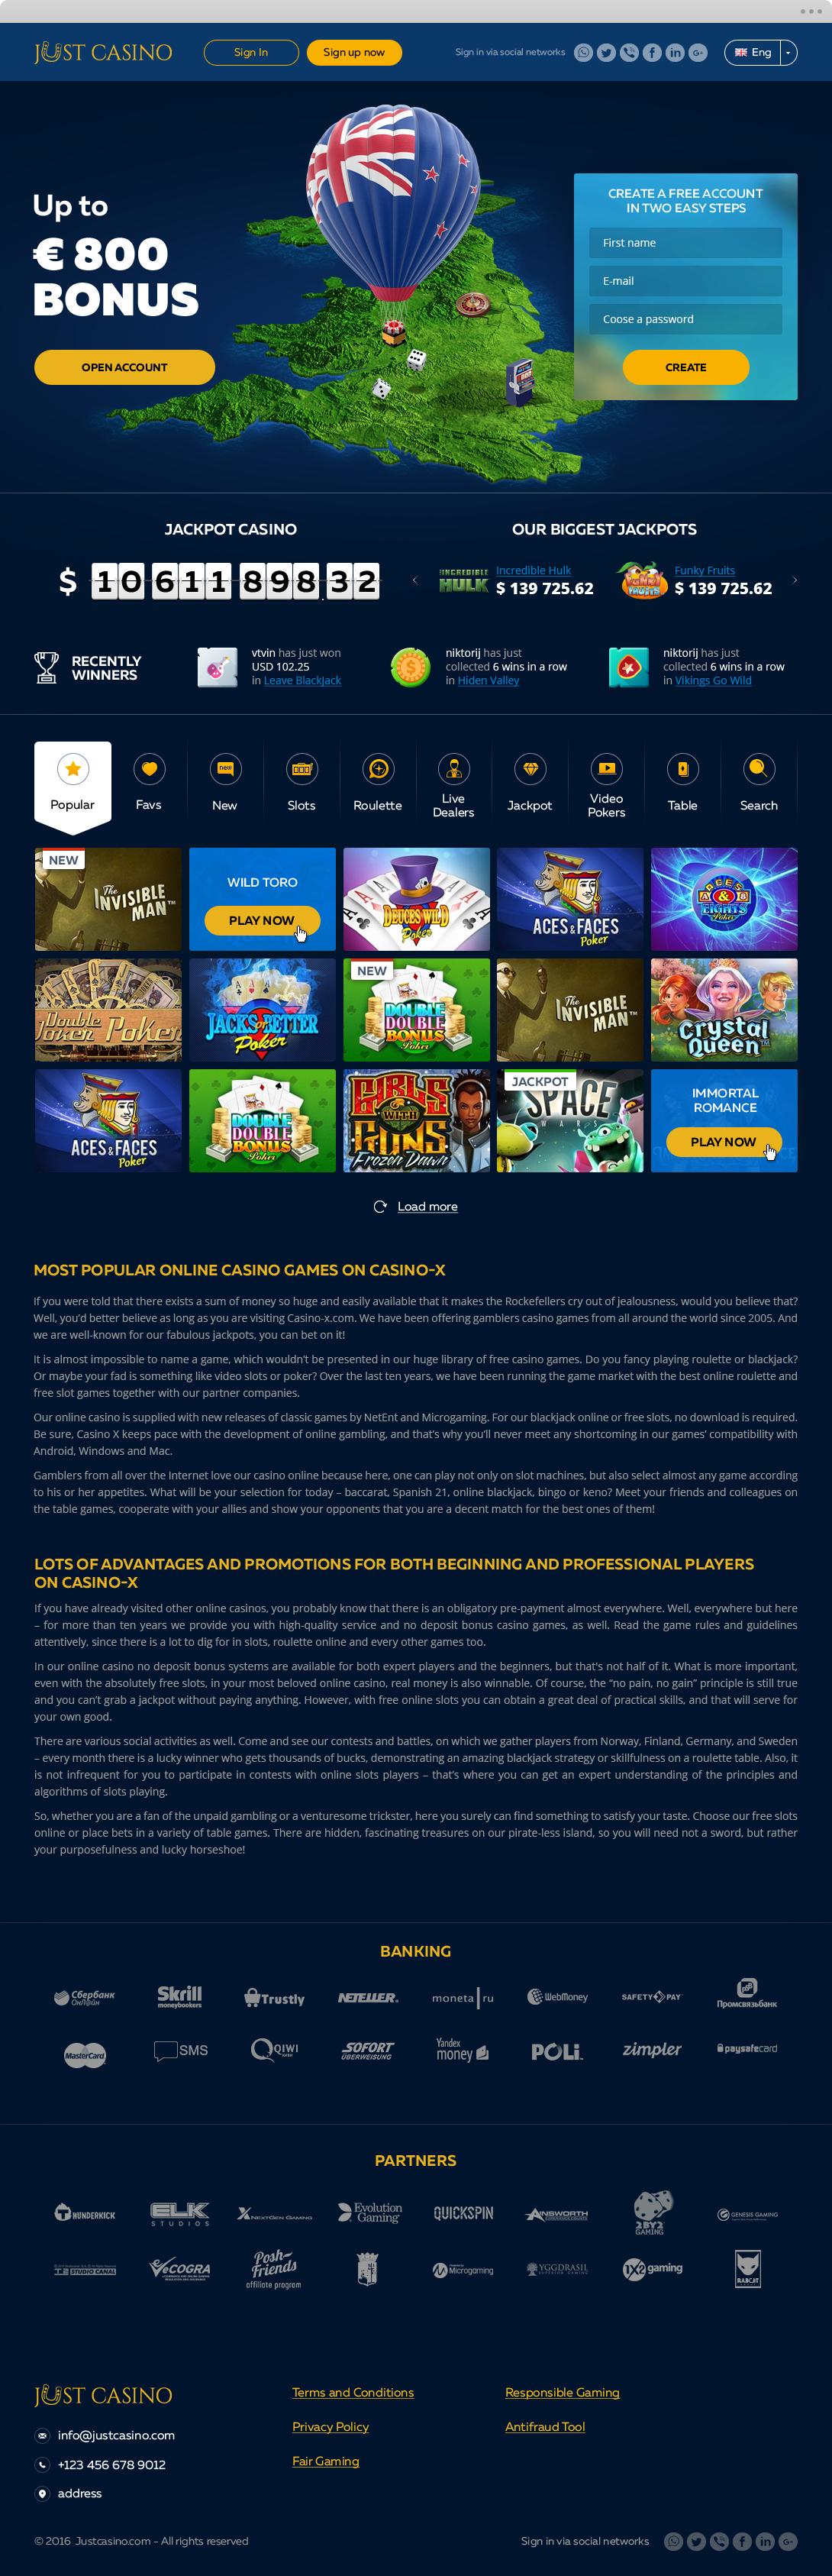 Дизайн сайта для Just Casino